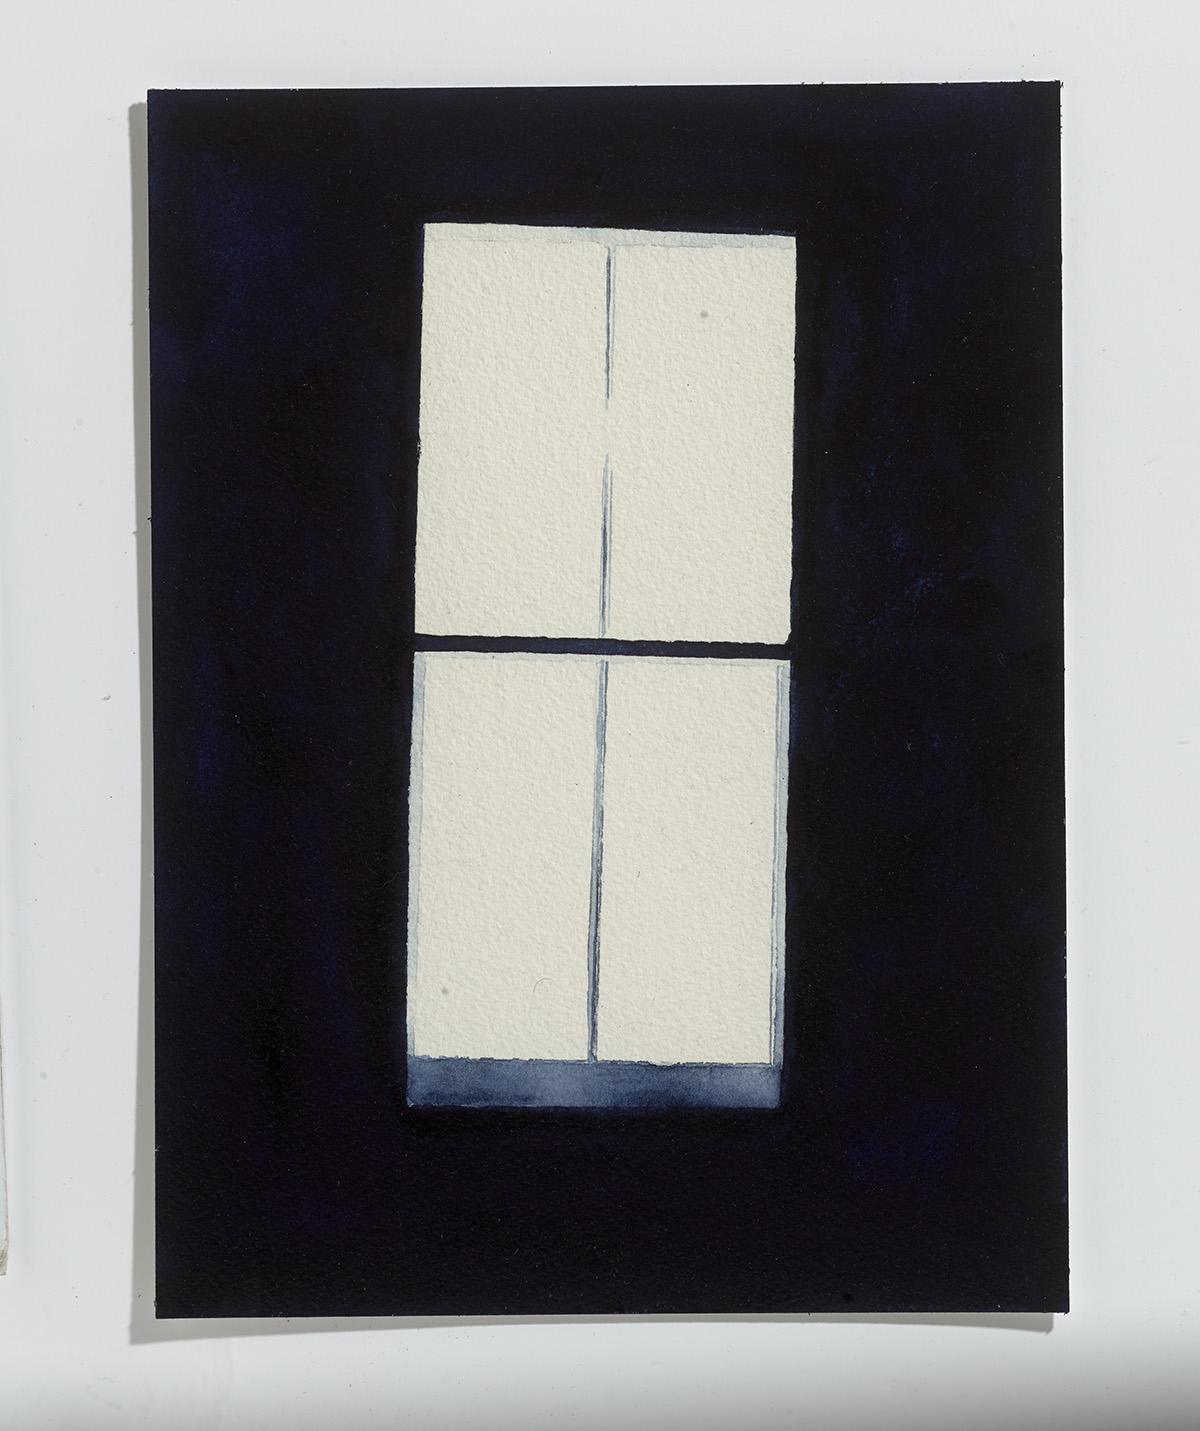 Indigo Window,2017,watercolour on paper, 12.5 x 9 in